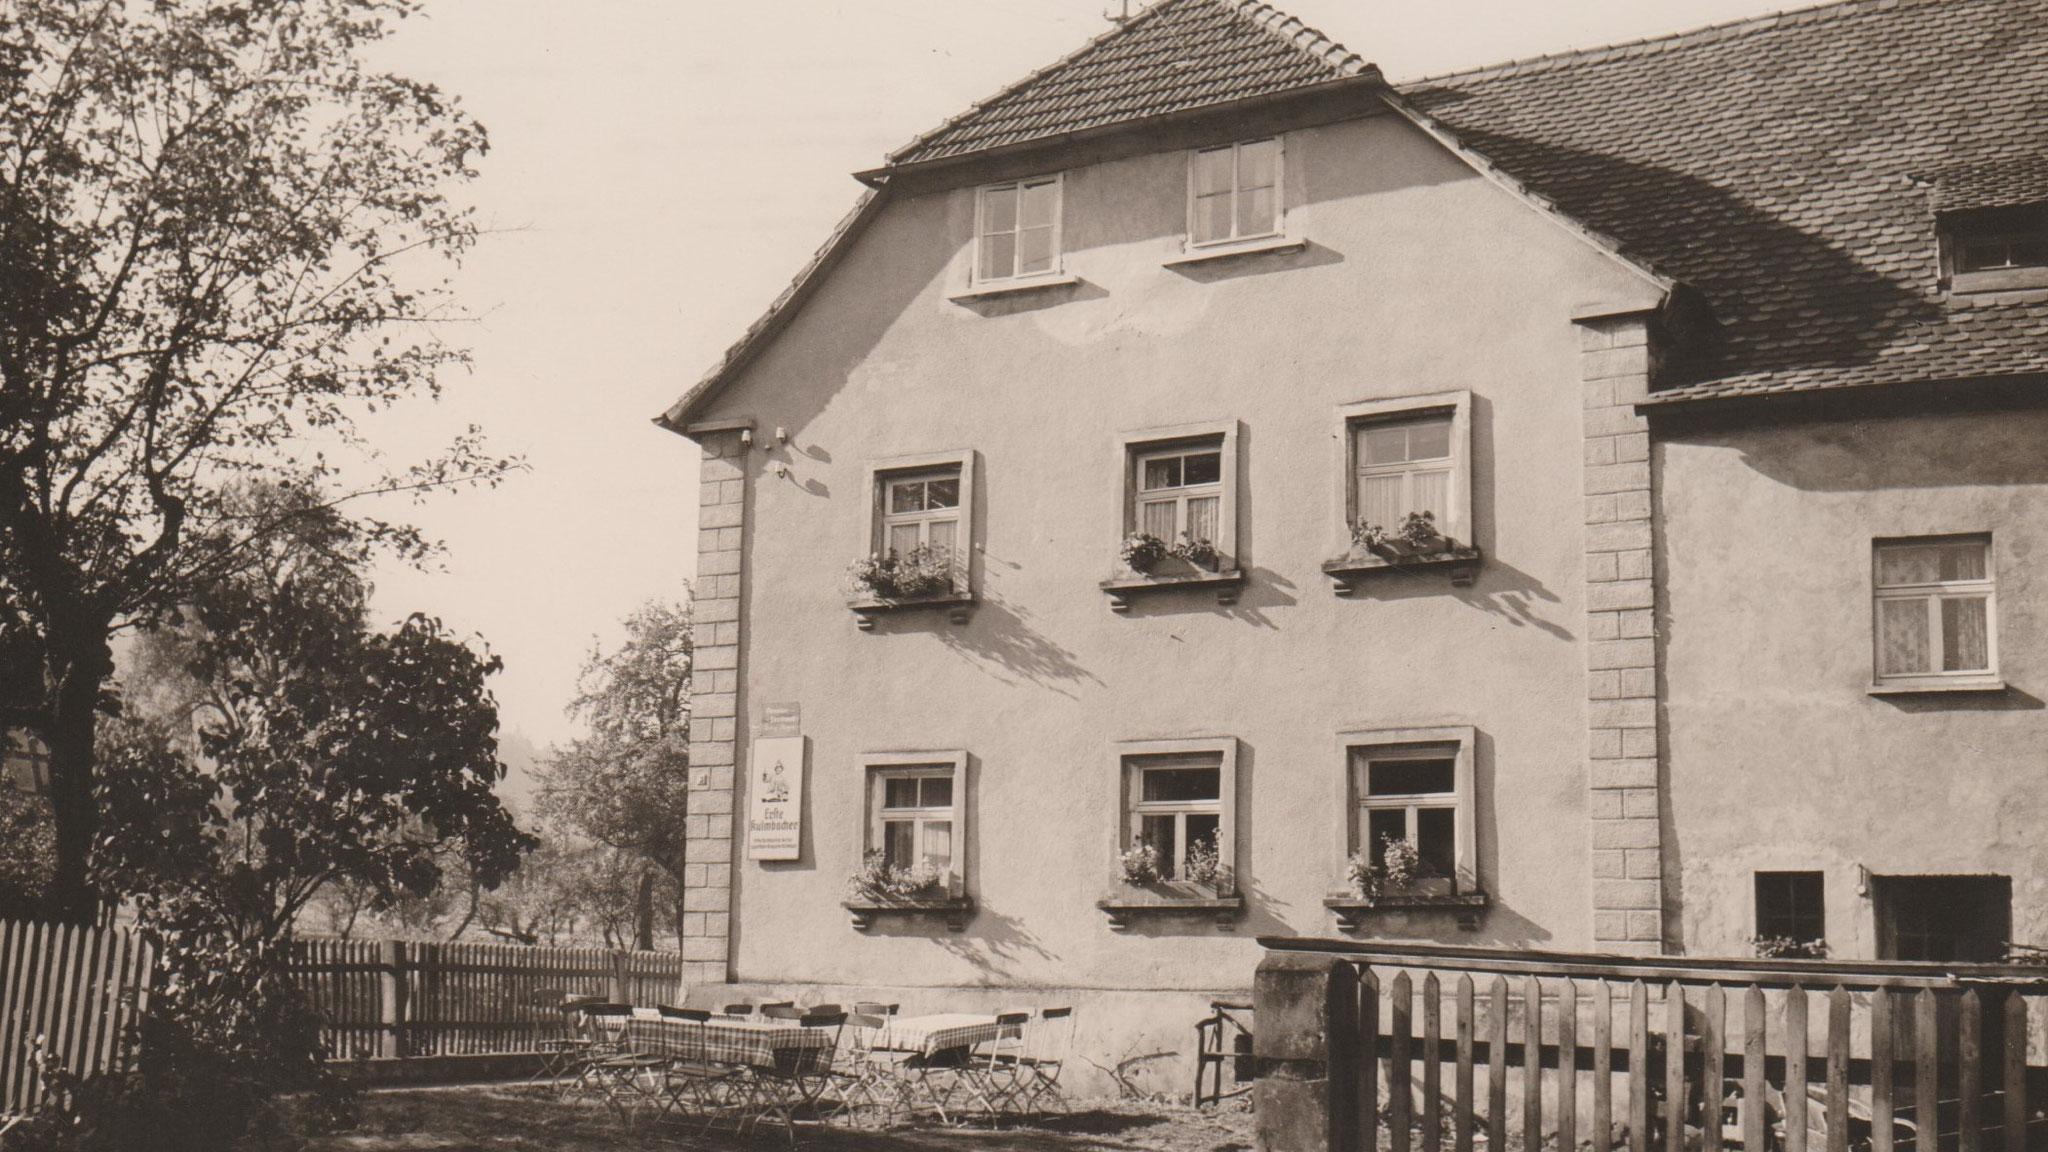 Der Landgasthof Bieger in Rothenbühl 1955.